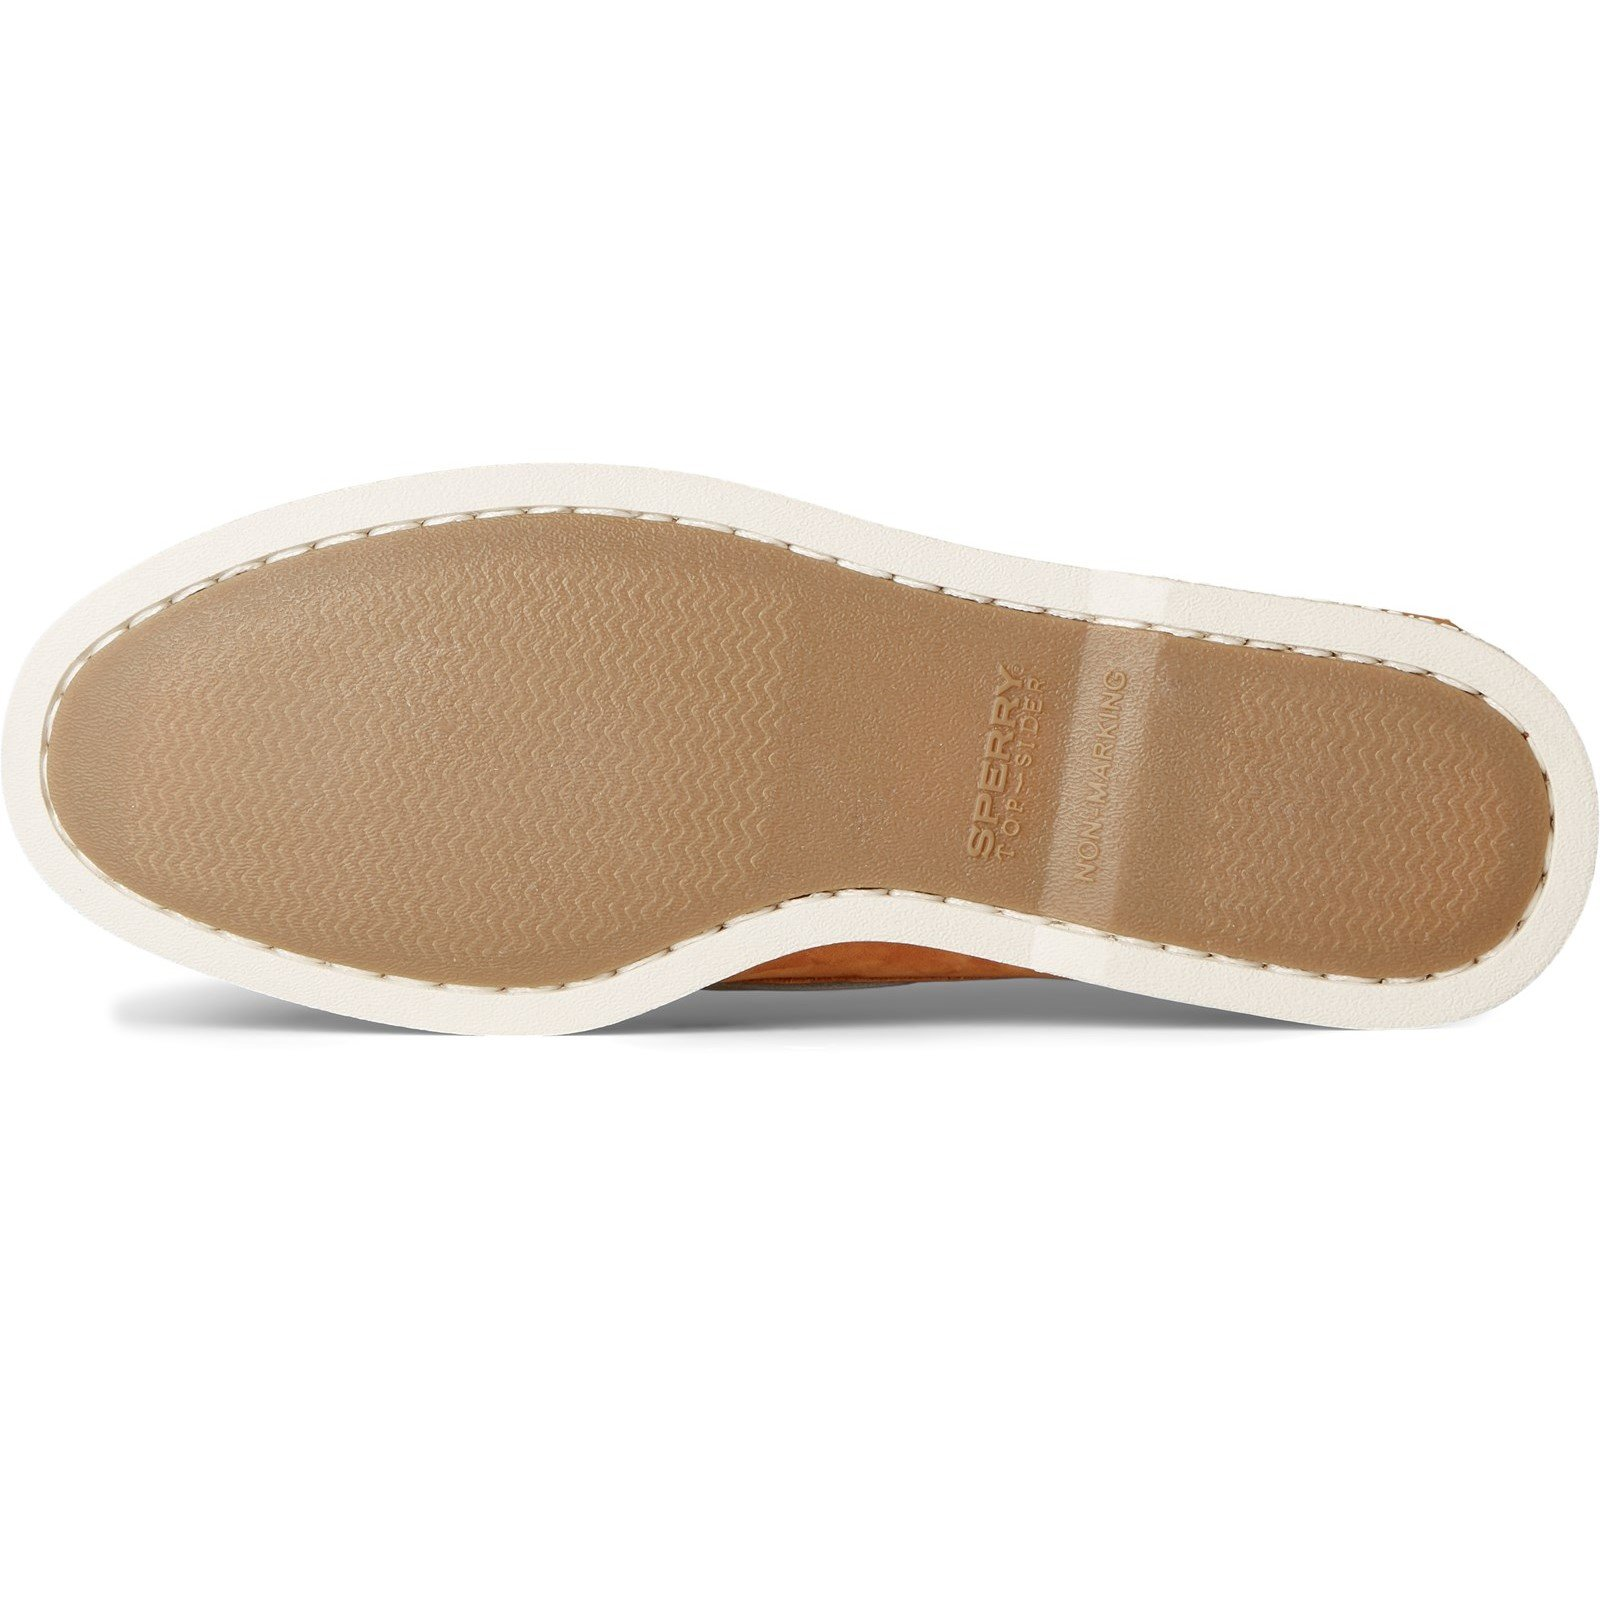 Sperry Men's A/O 2-Eye Nubuck Boat Shoe Various Colours 32920 - Tan 7